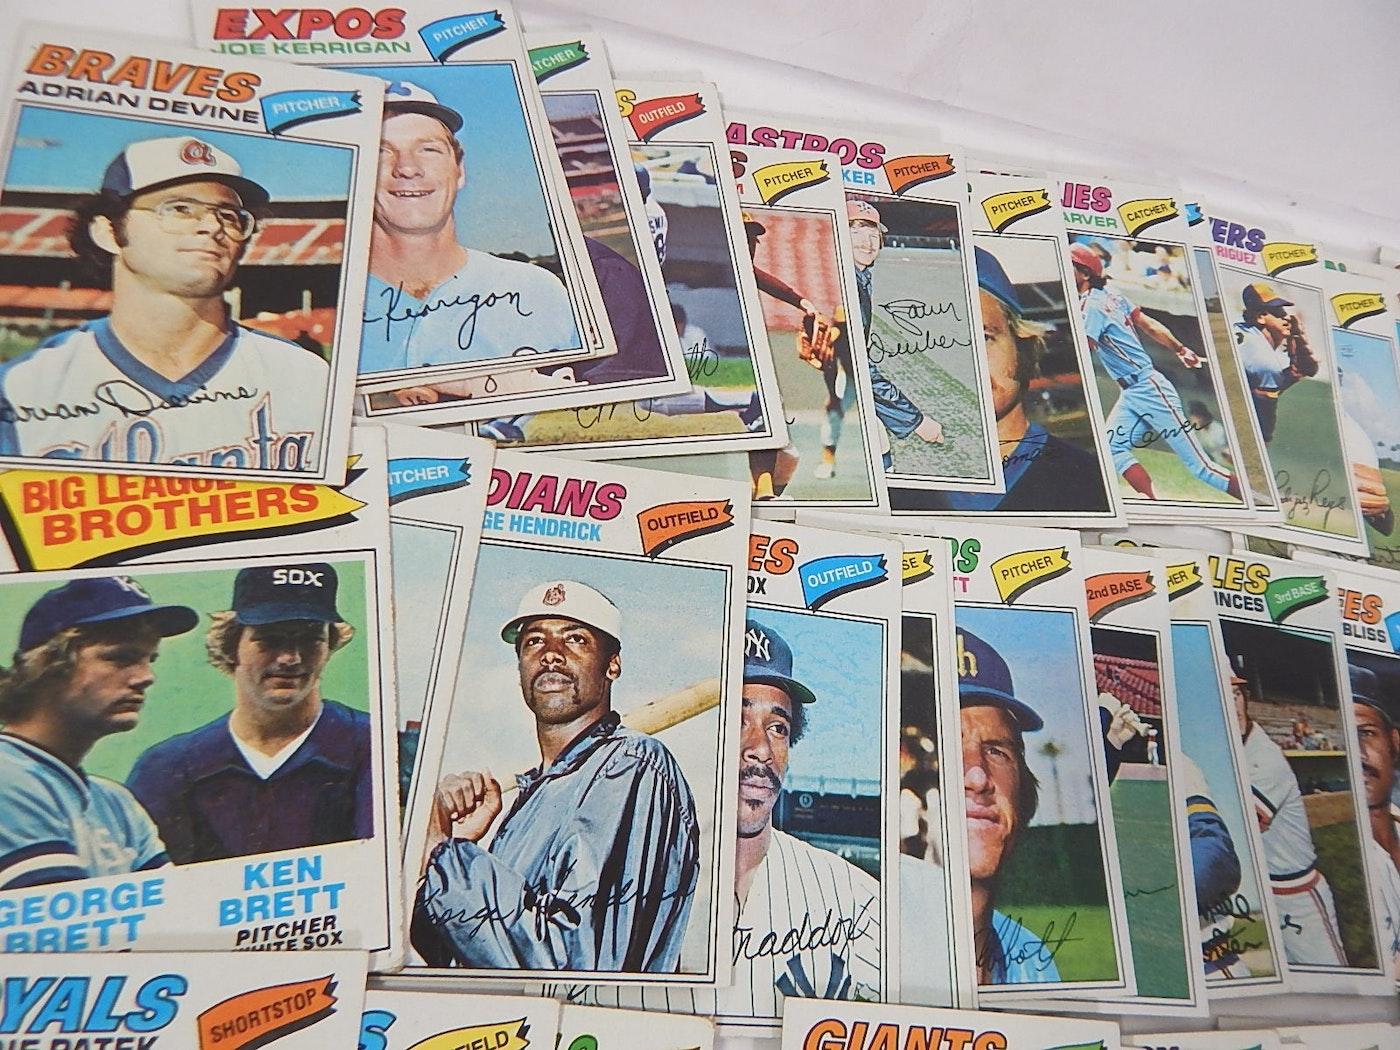 1977 Topps Baseball Cards With B. Robinson, N.Ryan, G